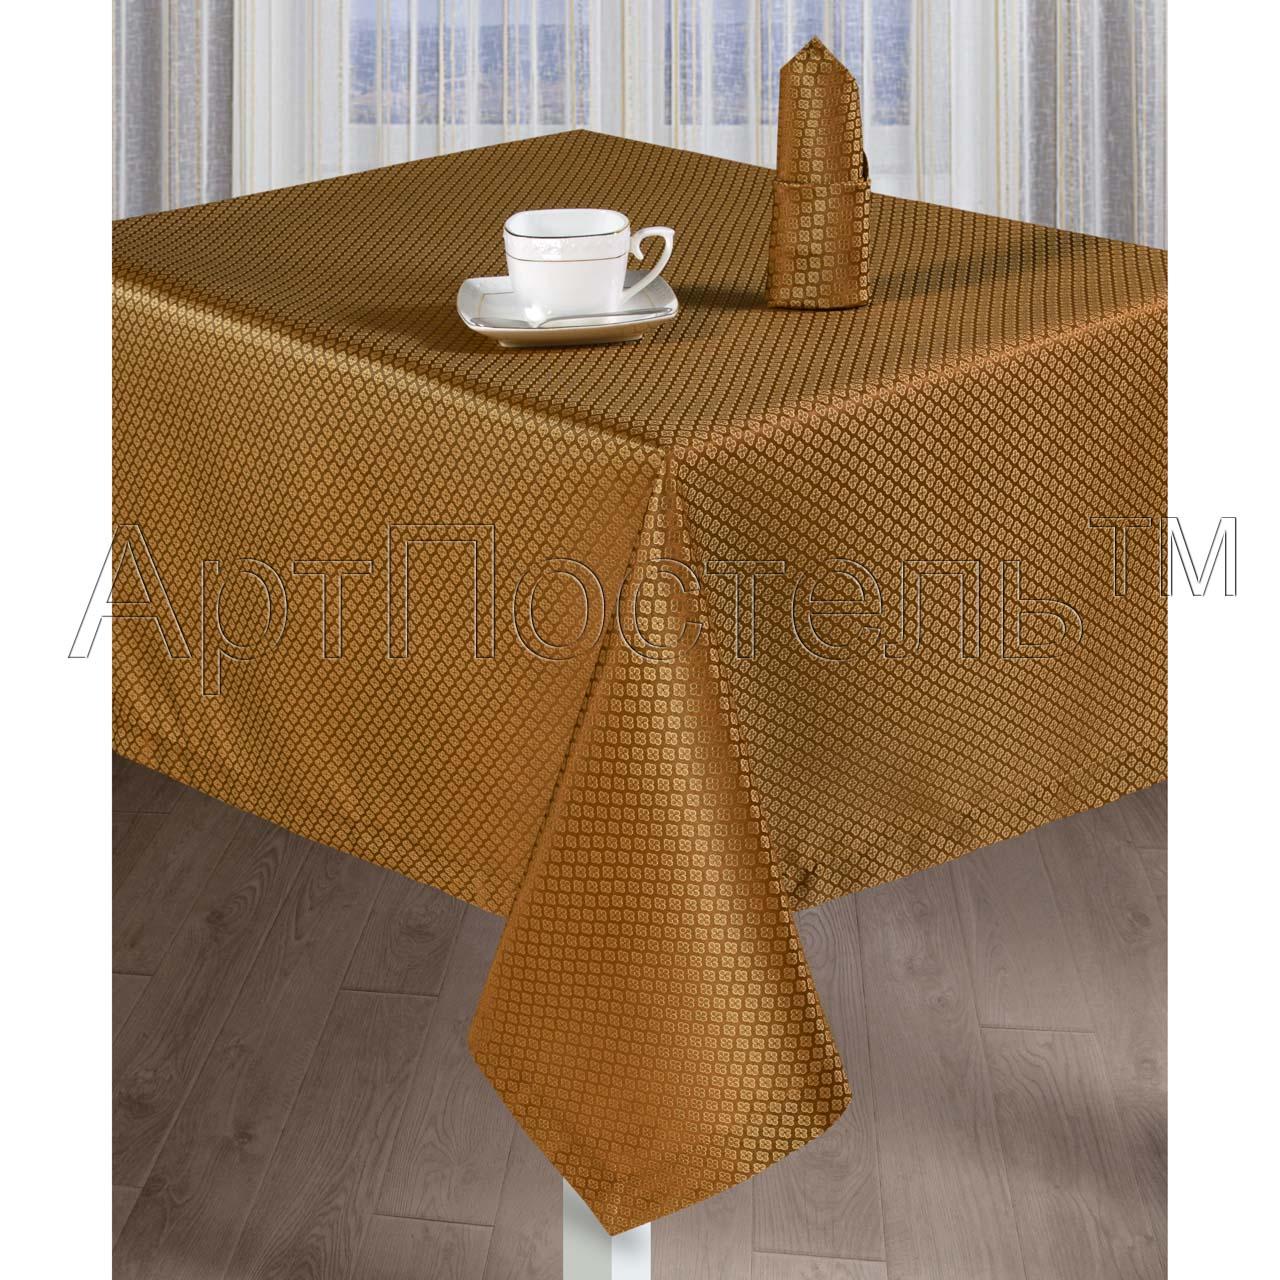 Кухонные принадлежности Мелиса Золото р. 260х150Скатерти<br>Скатерть: 260х150 см - 1 шт. <br>Салфетка: 40х40 см - 6 шт.<br><br>Тип: Кухонные принадлежности<br>Размер: 260х150<br>Материал: Жаккард